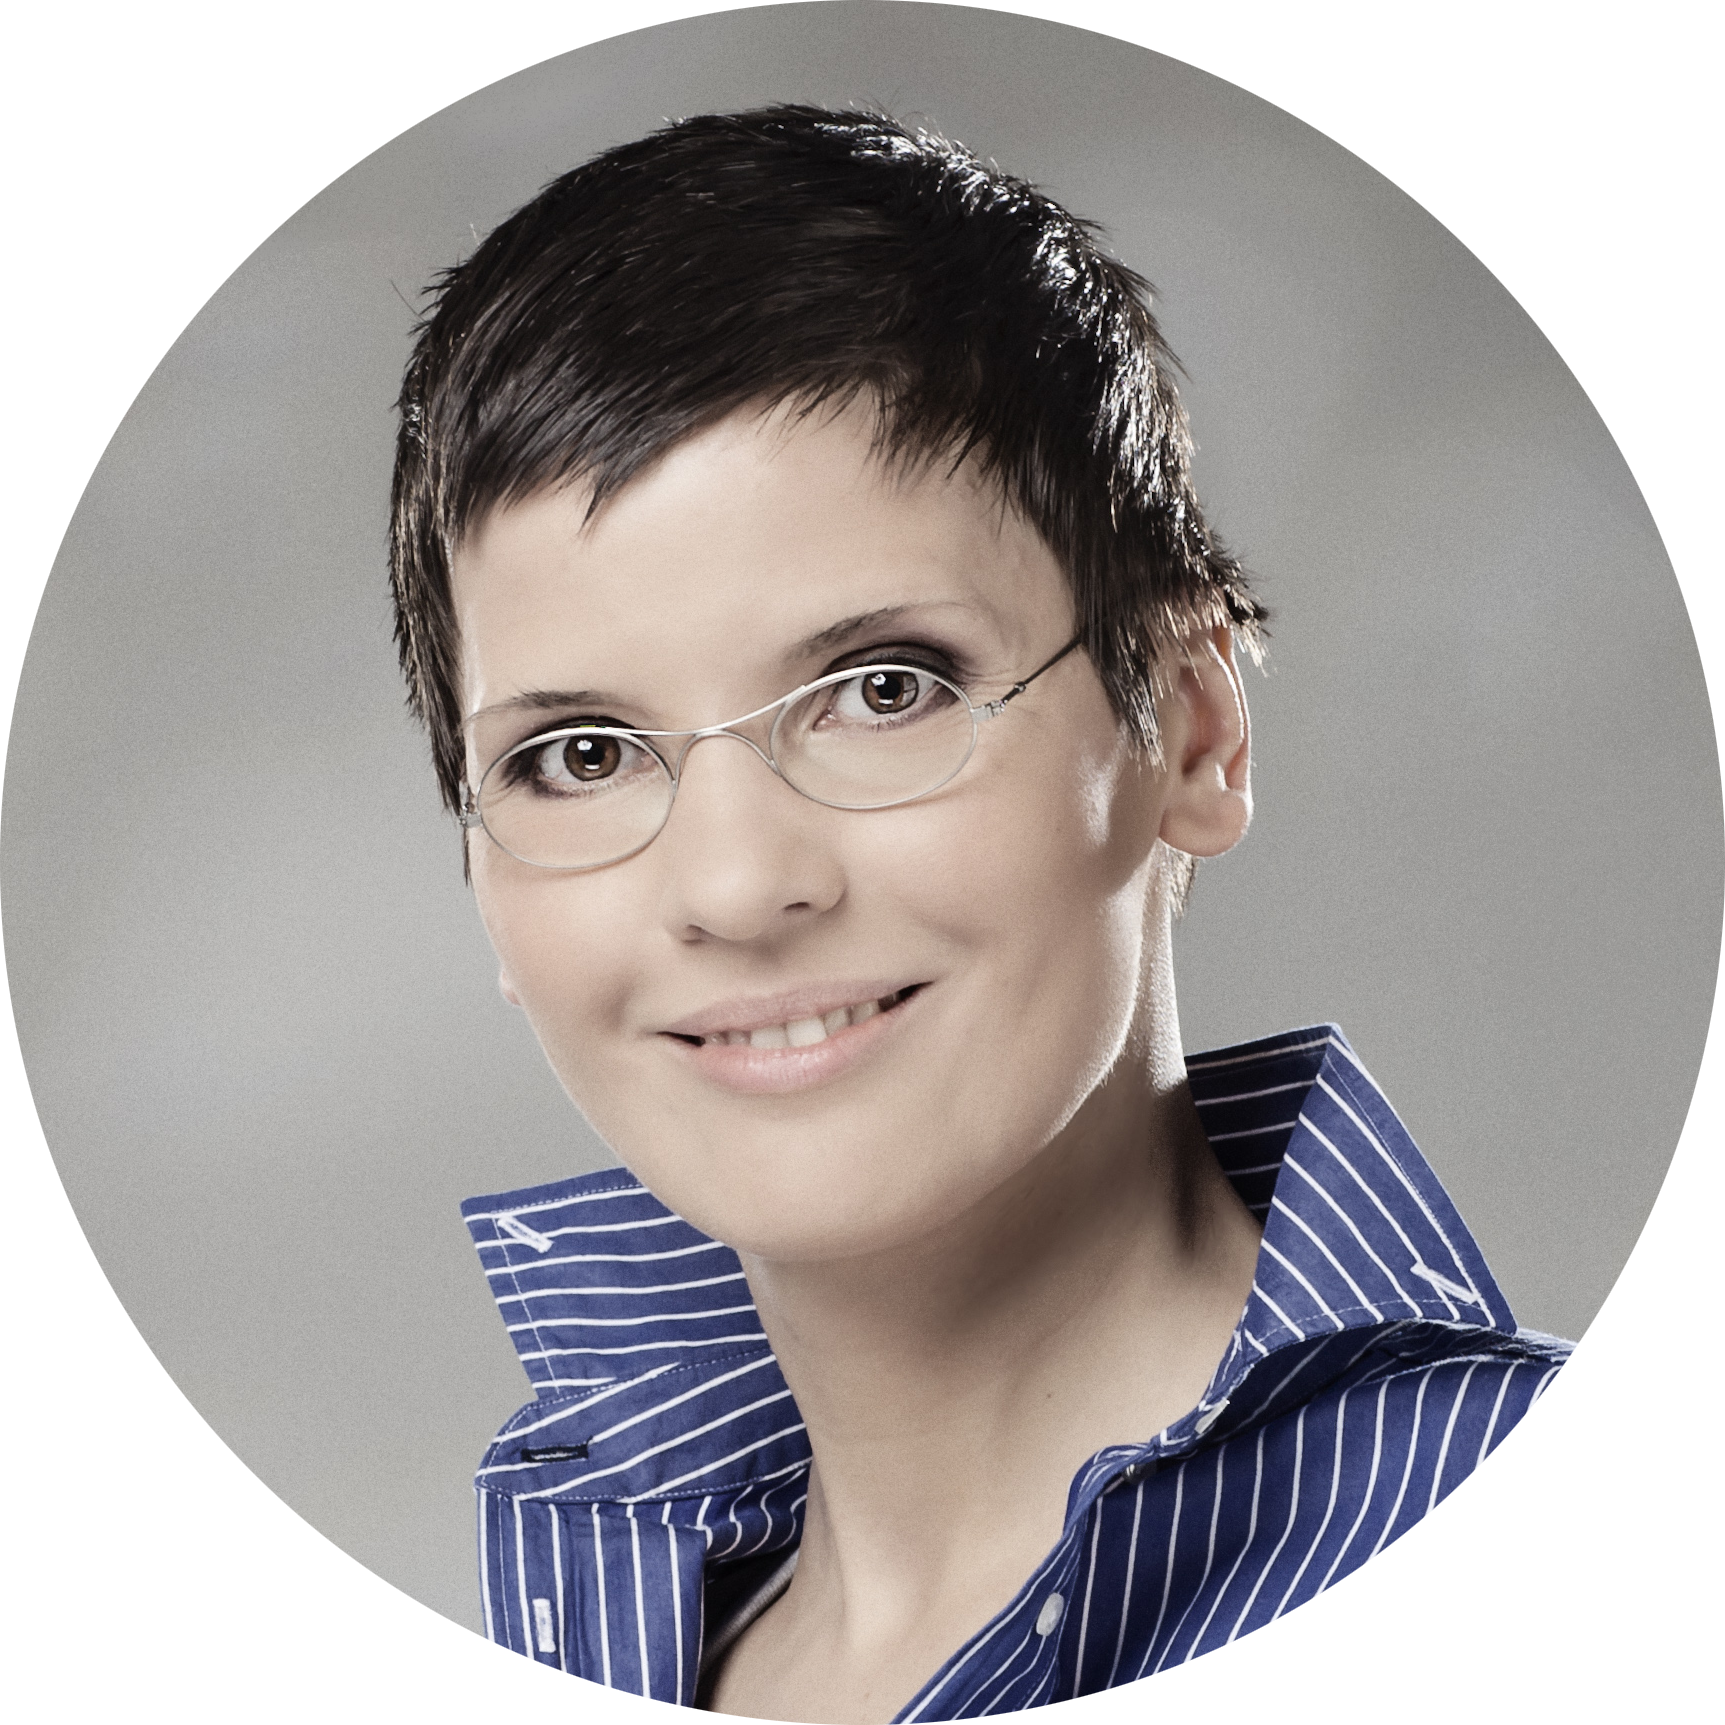 Agnieszka Wasilewska